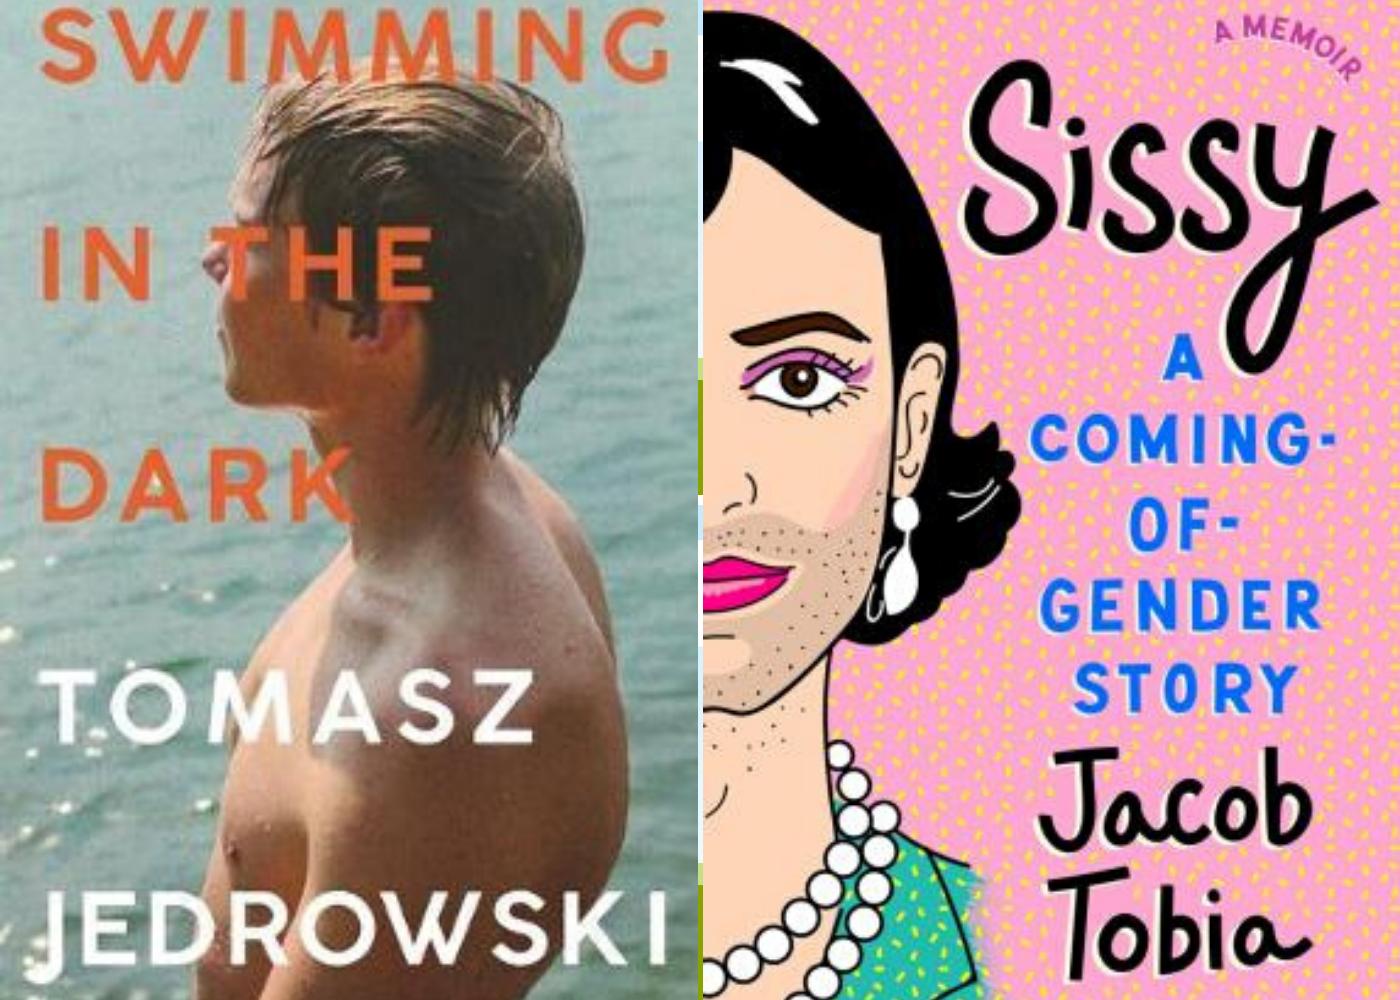 Swimming in the Dark | Sissy, A Coming-of-Gender Story | Honeycombers Book Club June 2020